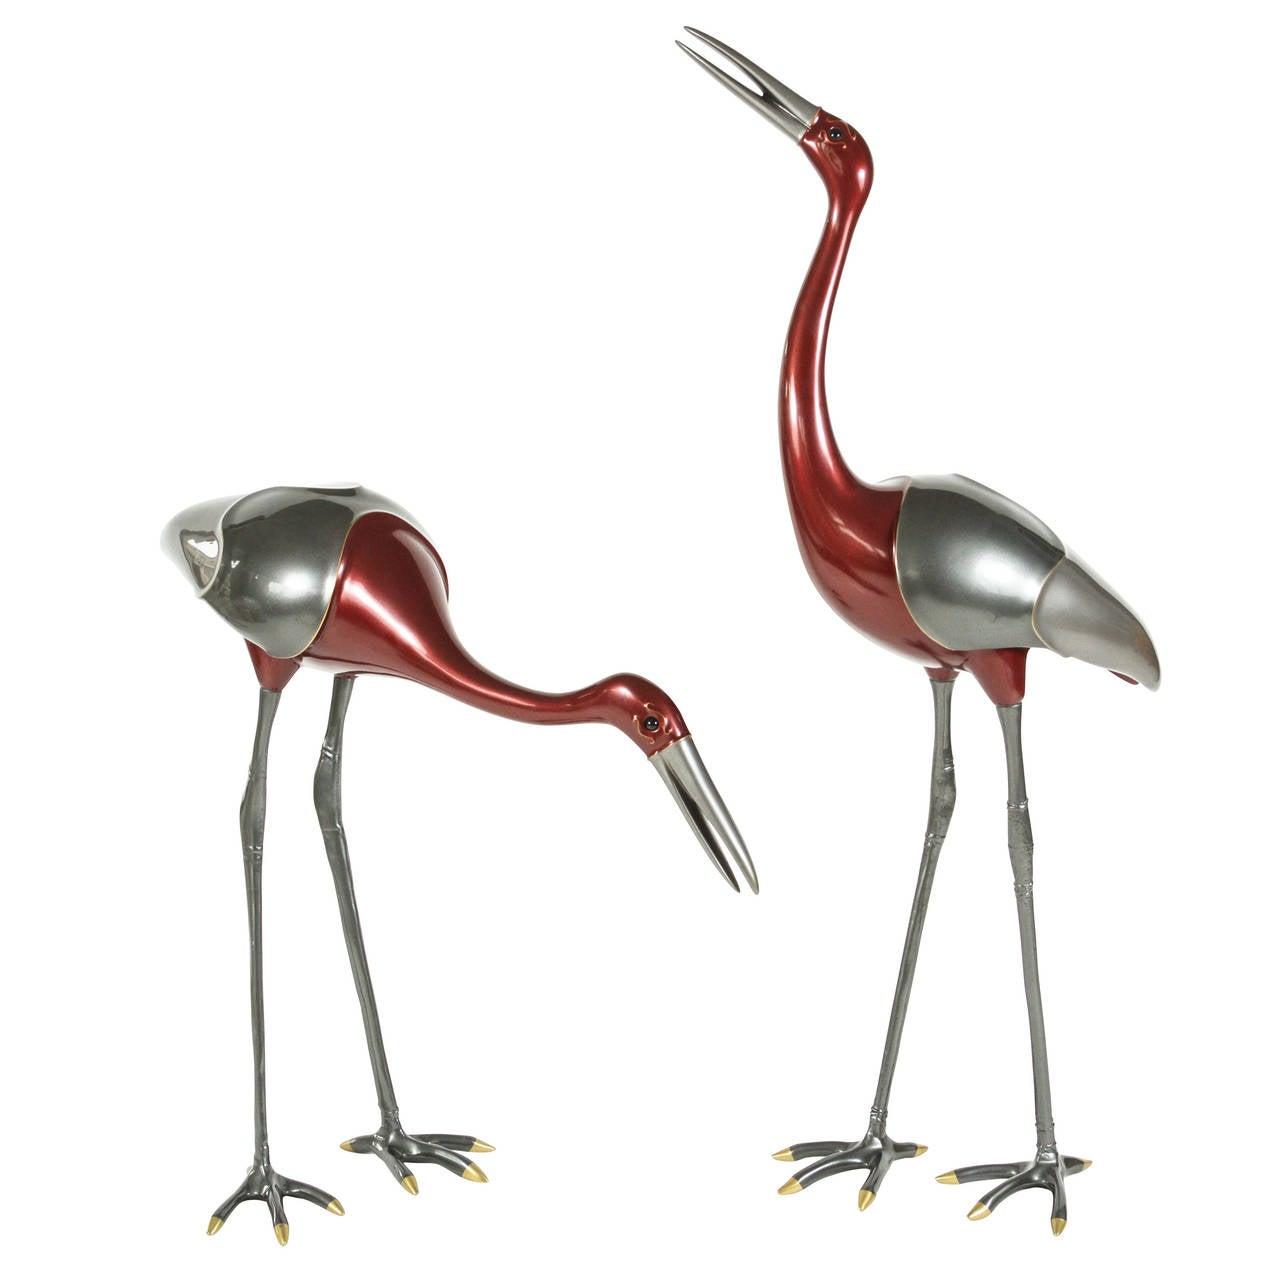 Pair of Large-Scale Decorative Crane Sculptures